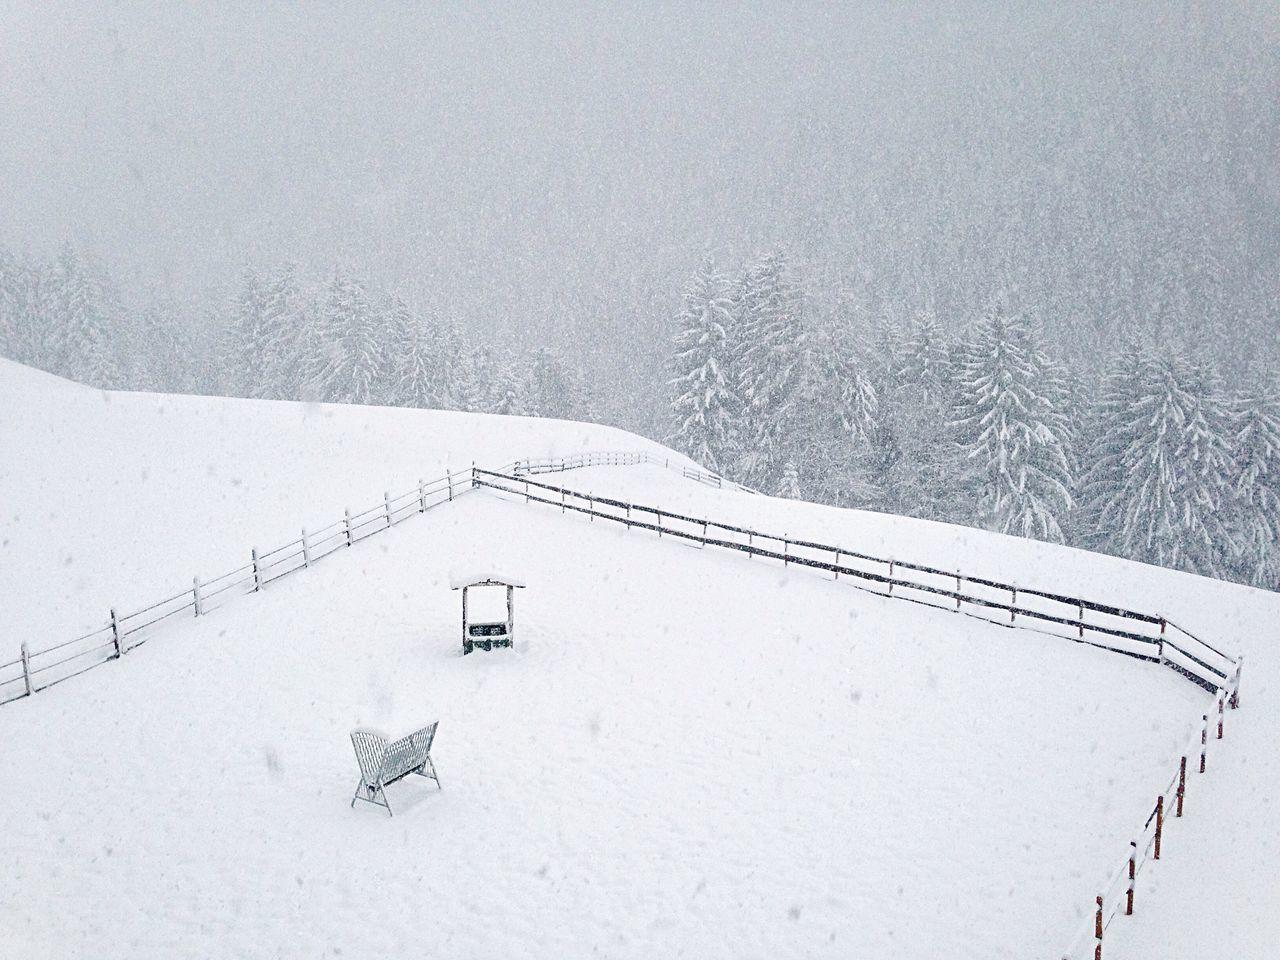 Snow Winter Wintertime Landscape Village Welschnofen Nova Levante Italy Südtirol Snowing Fence